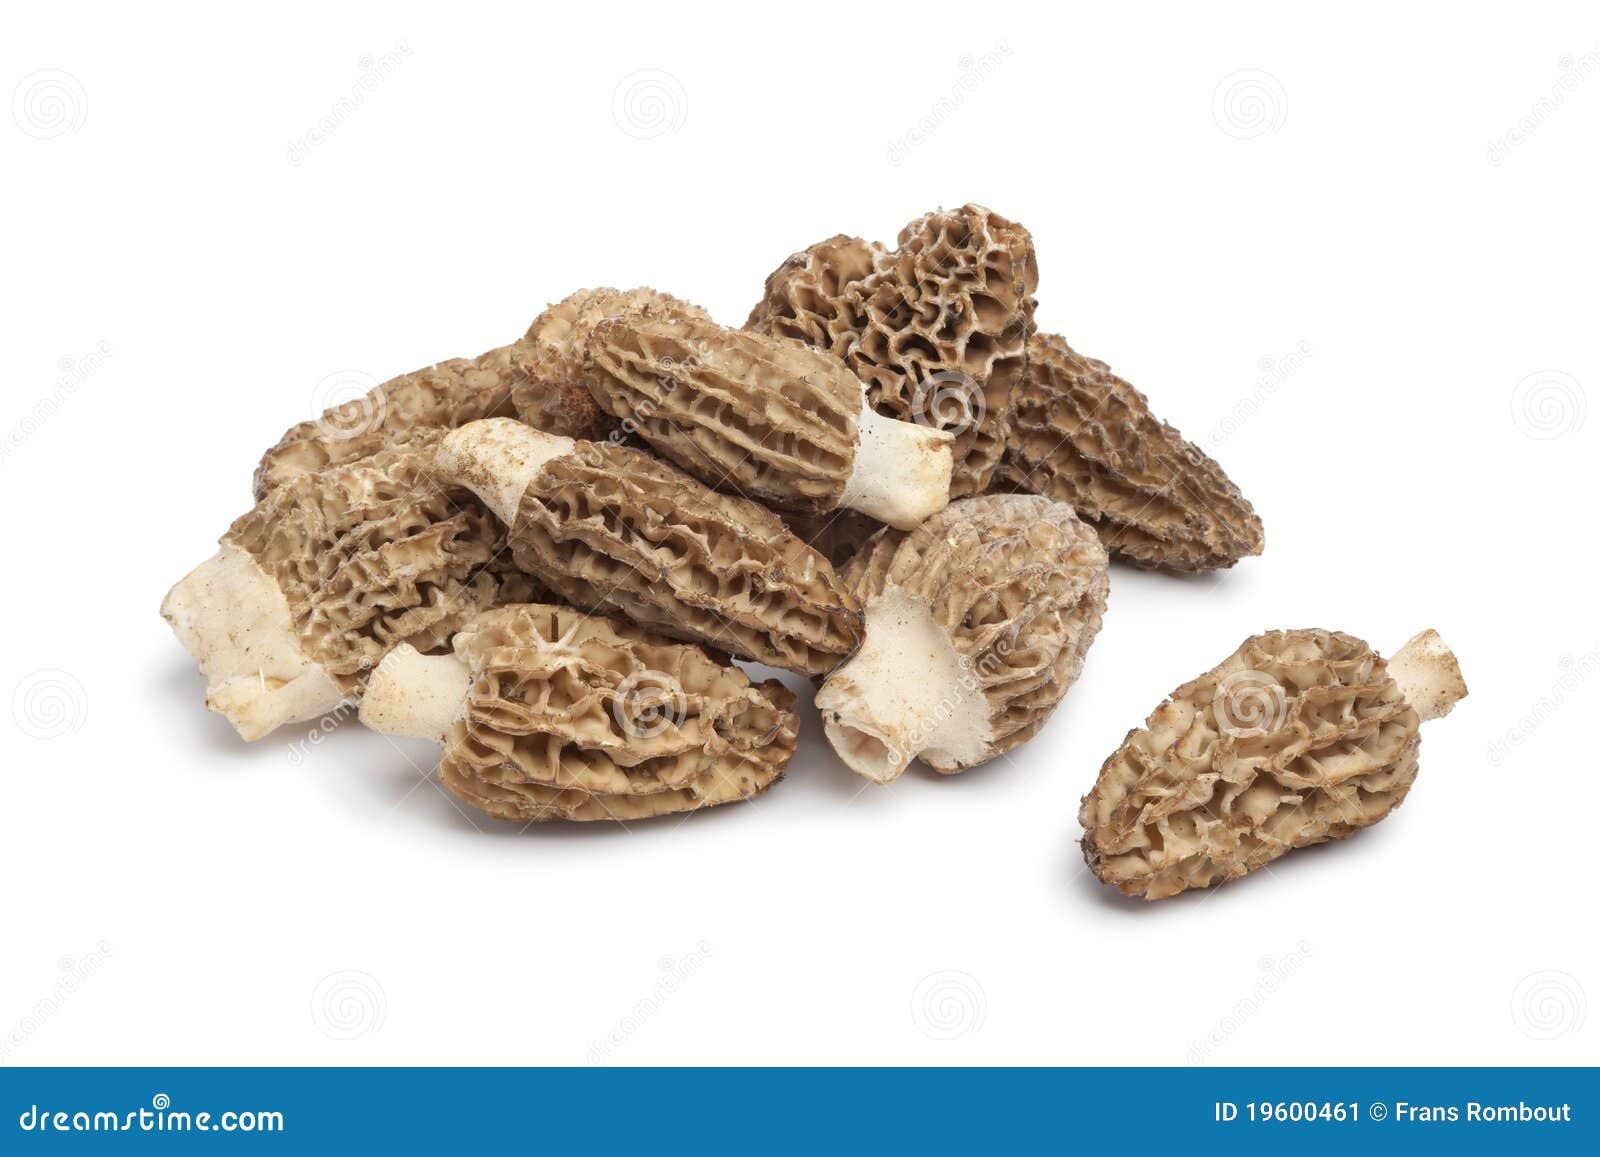 how to keep mushrooms fresh